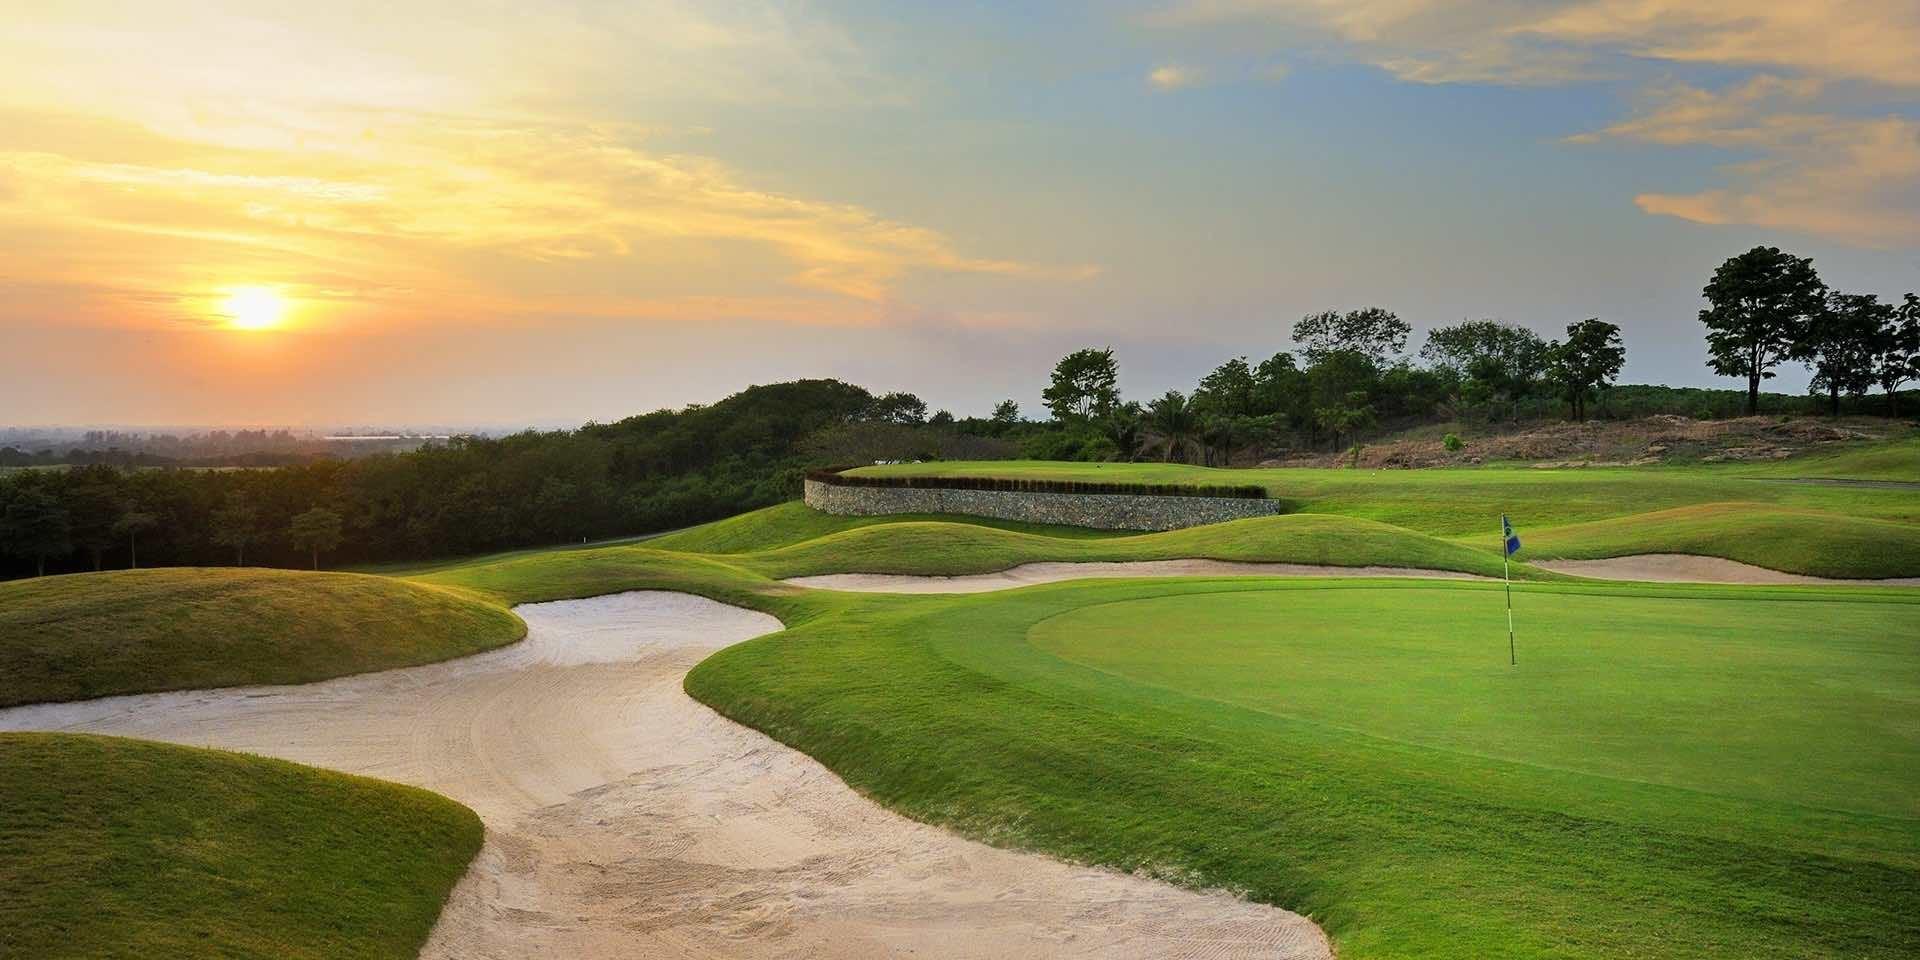 Burapha Golf & Resort Green View while sun sets in Pattaya